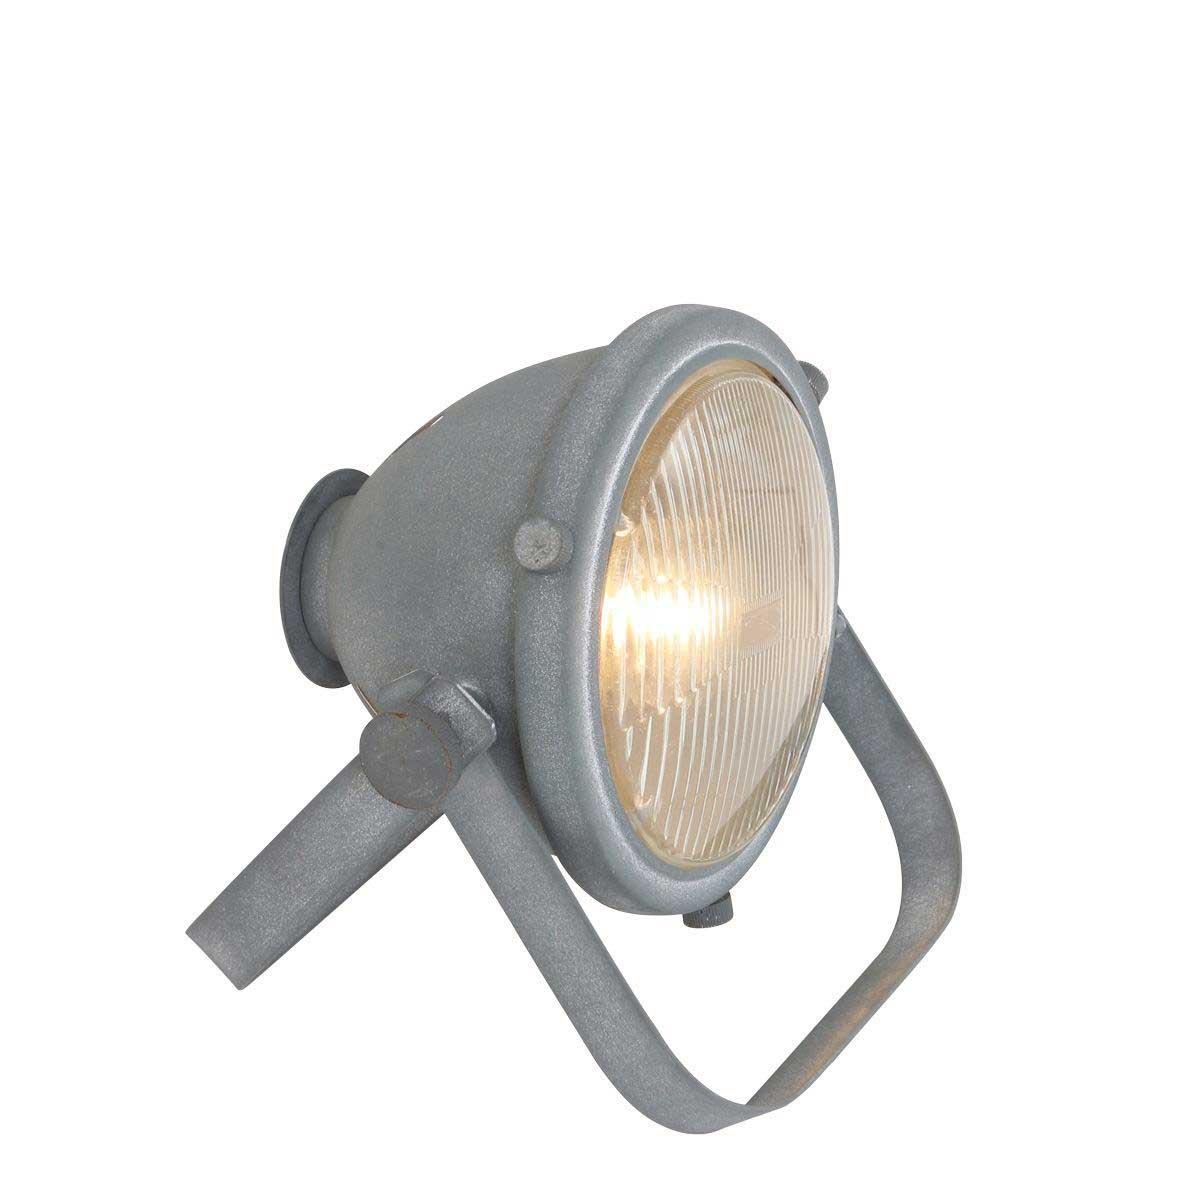 Industriële tafellamp 1-lichts beton MEXLITE - 1336GR - Tafellamp- Mexlite- Mexlite- Industrieel - Trendy- Grijs  Betongrijs met whitewash- Metaal